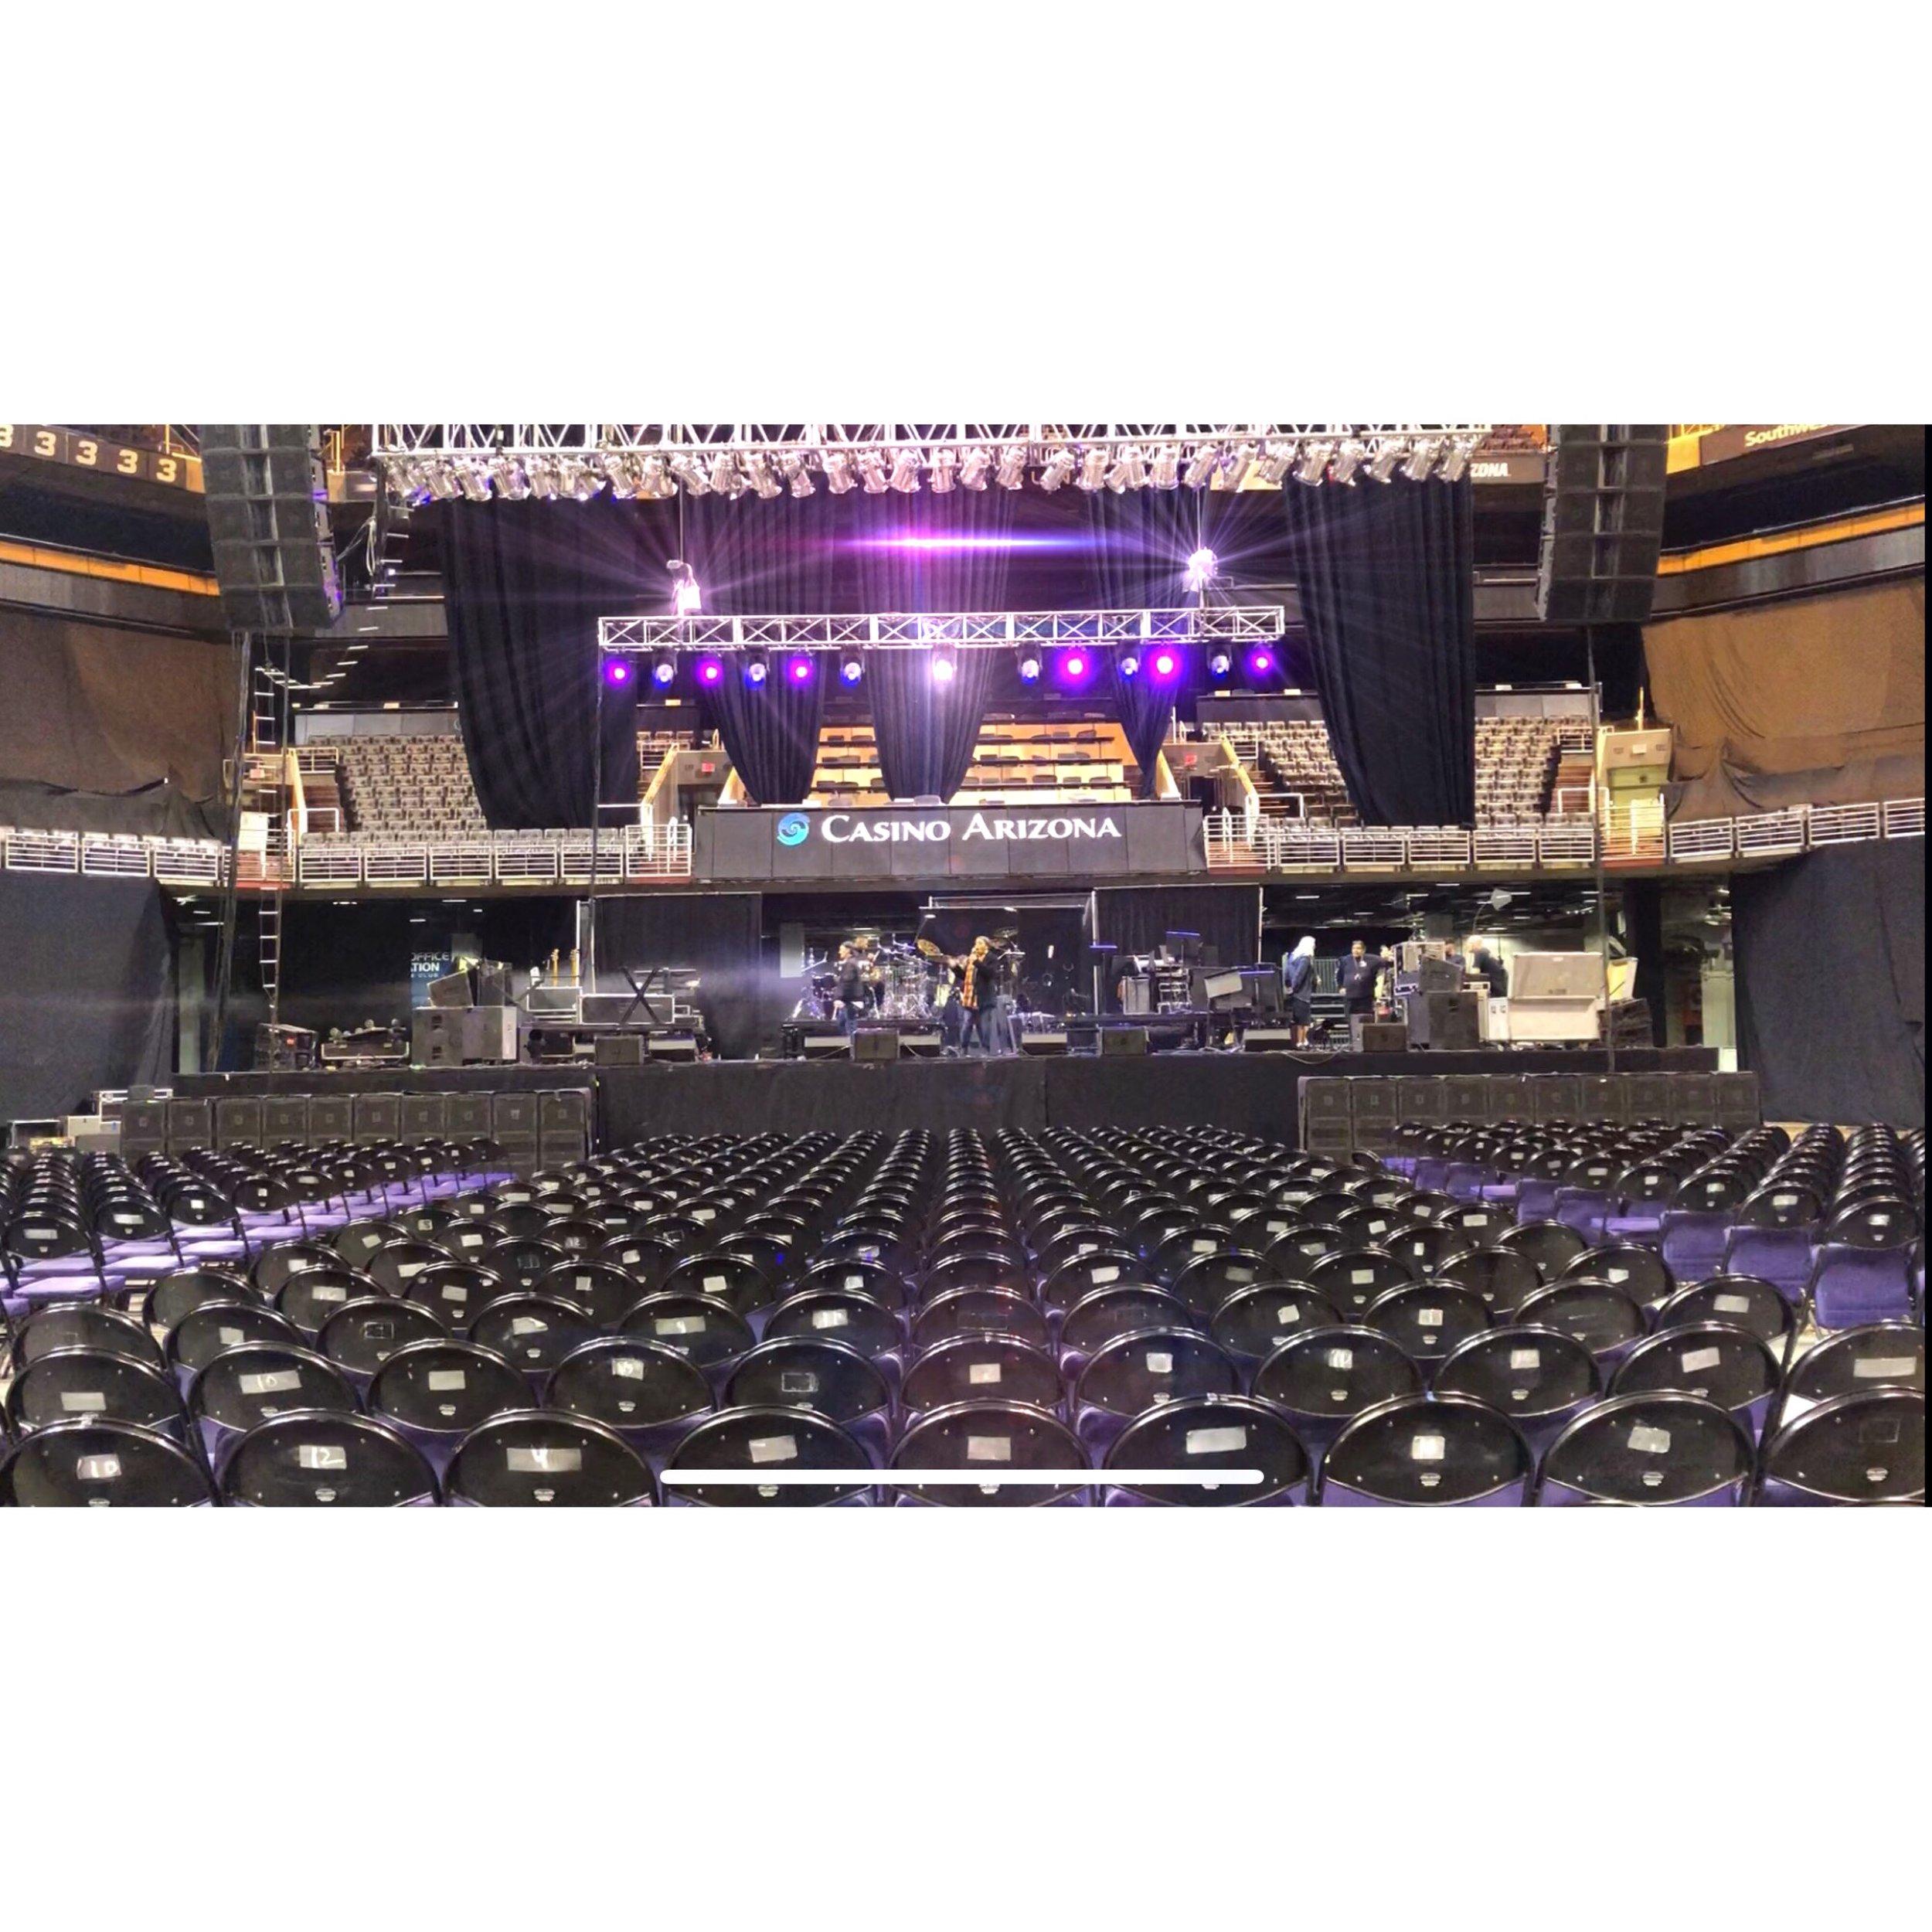 The Stage in Phoenix, AZ